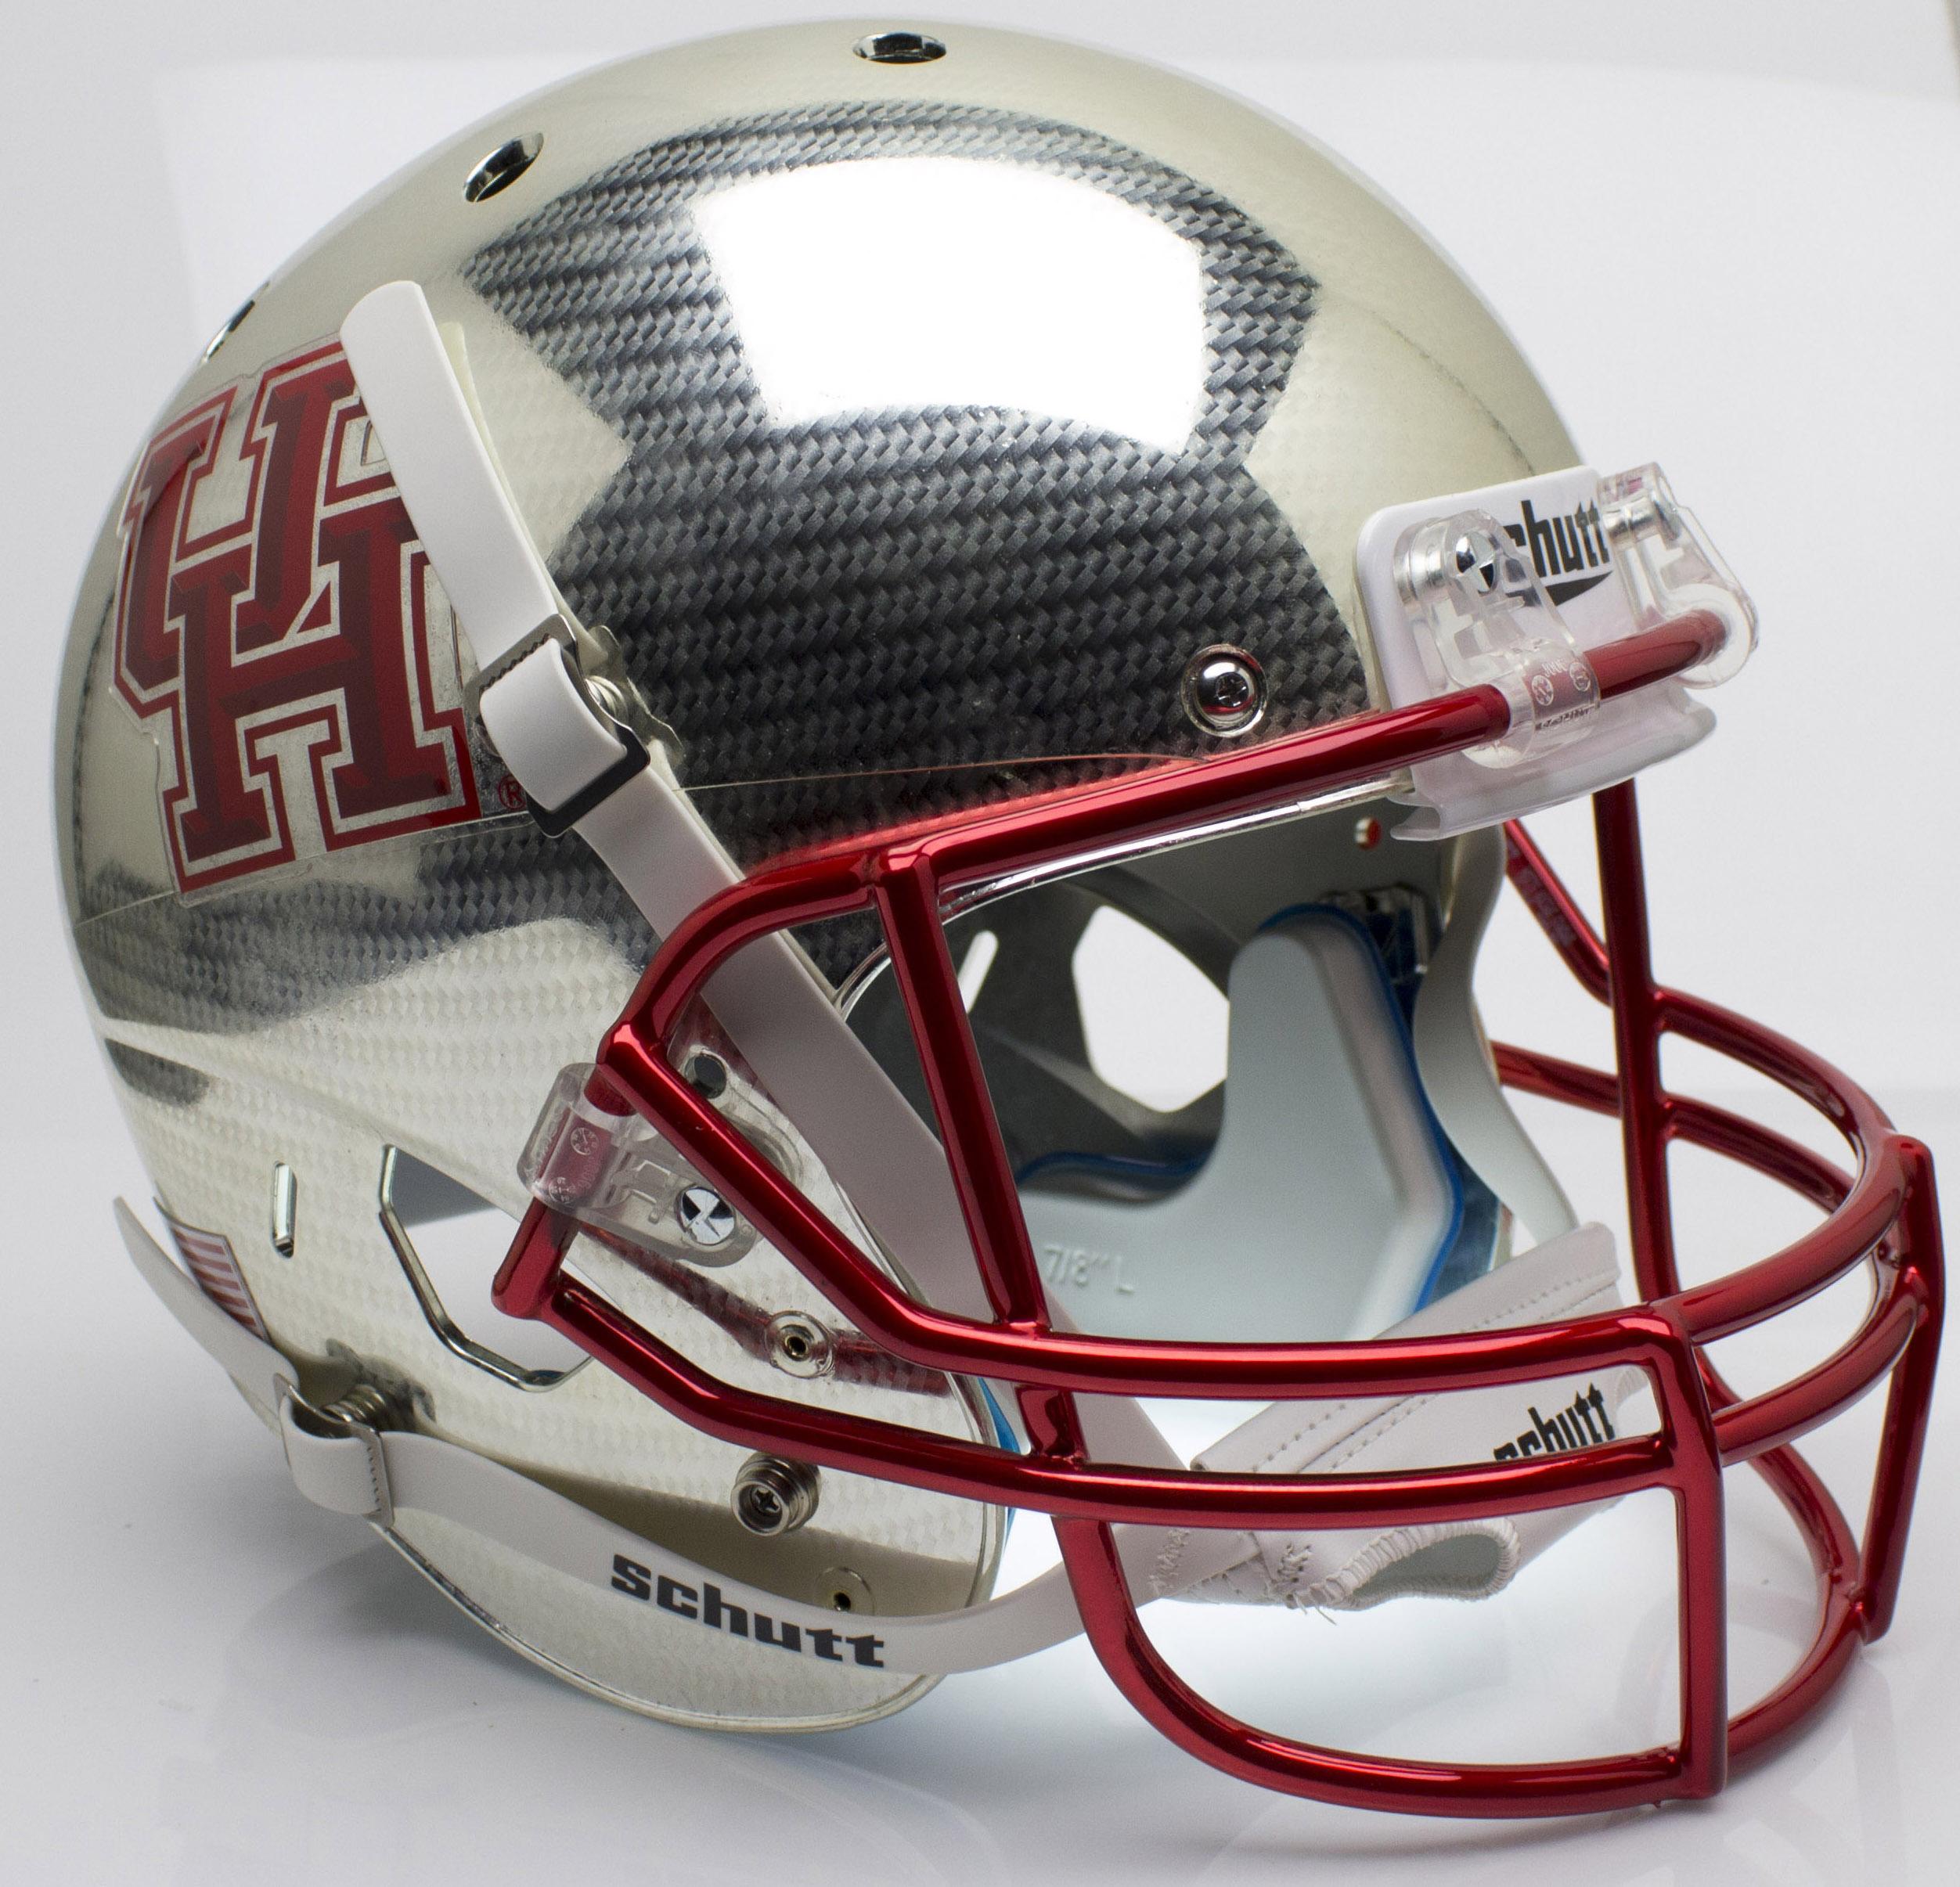 Houston Cougars Full XP Replica Football Helmet Schutt <B>Crosshatch</B>